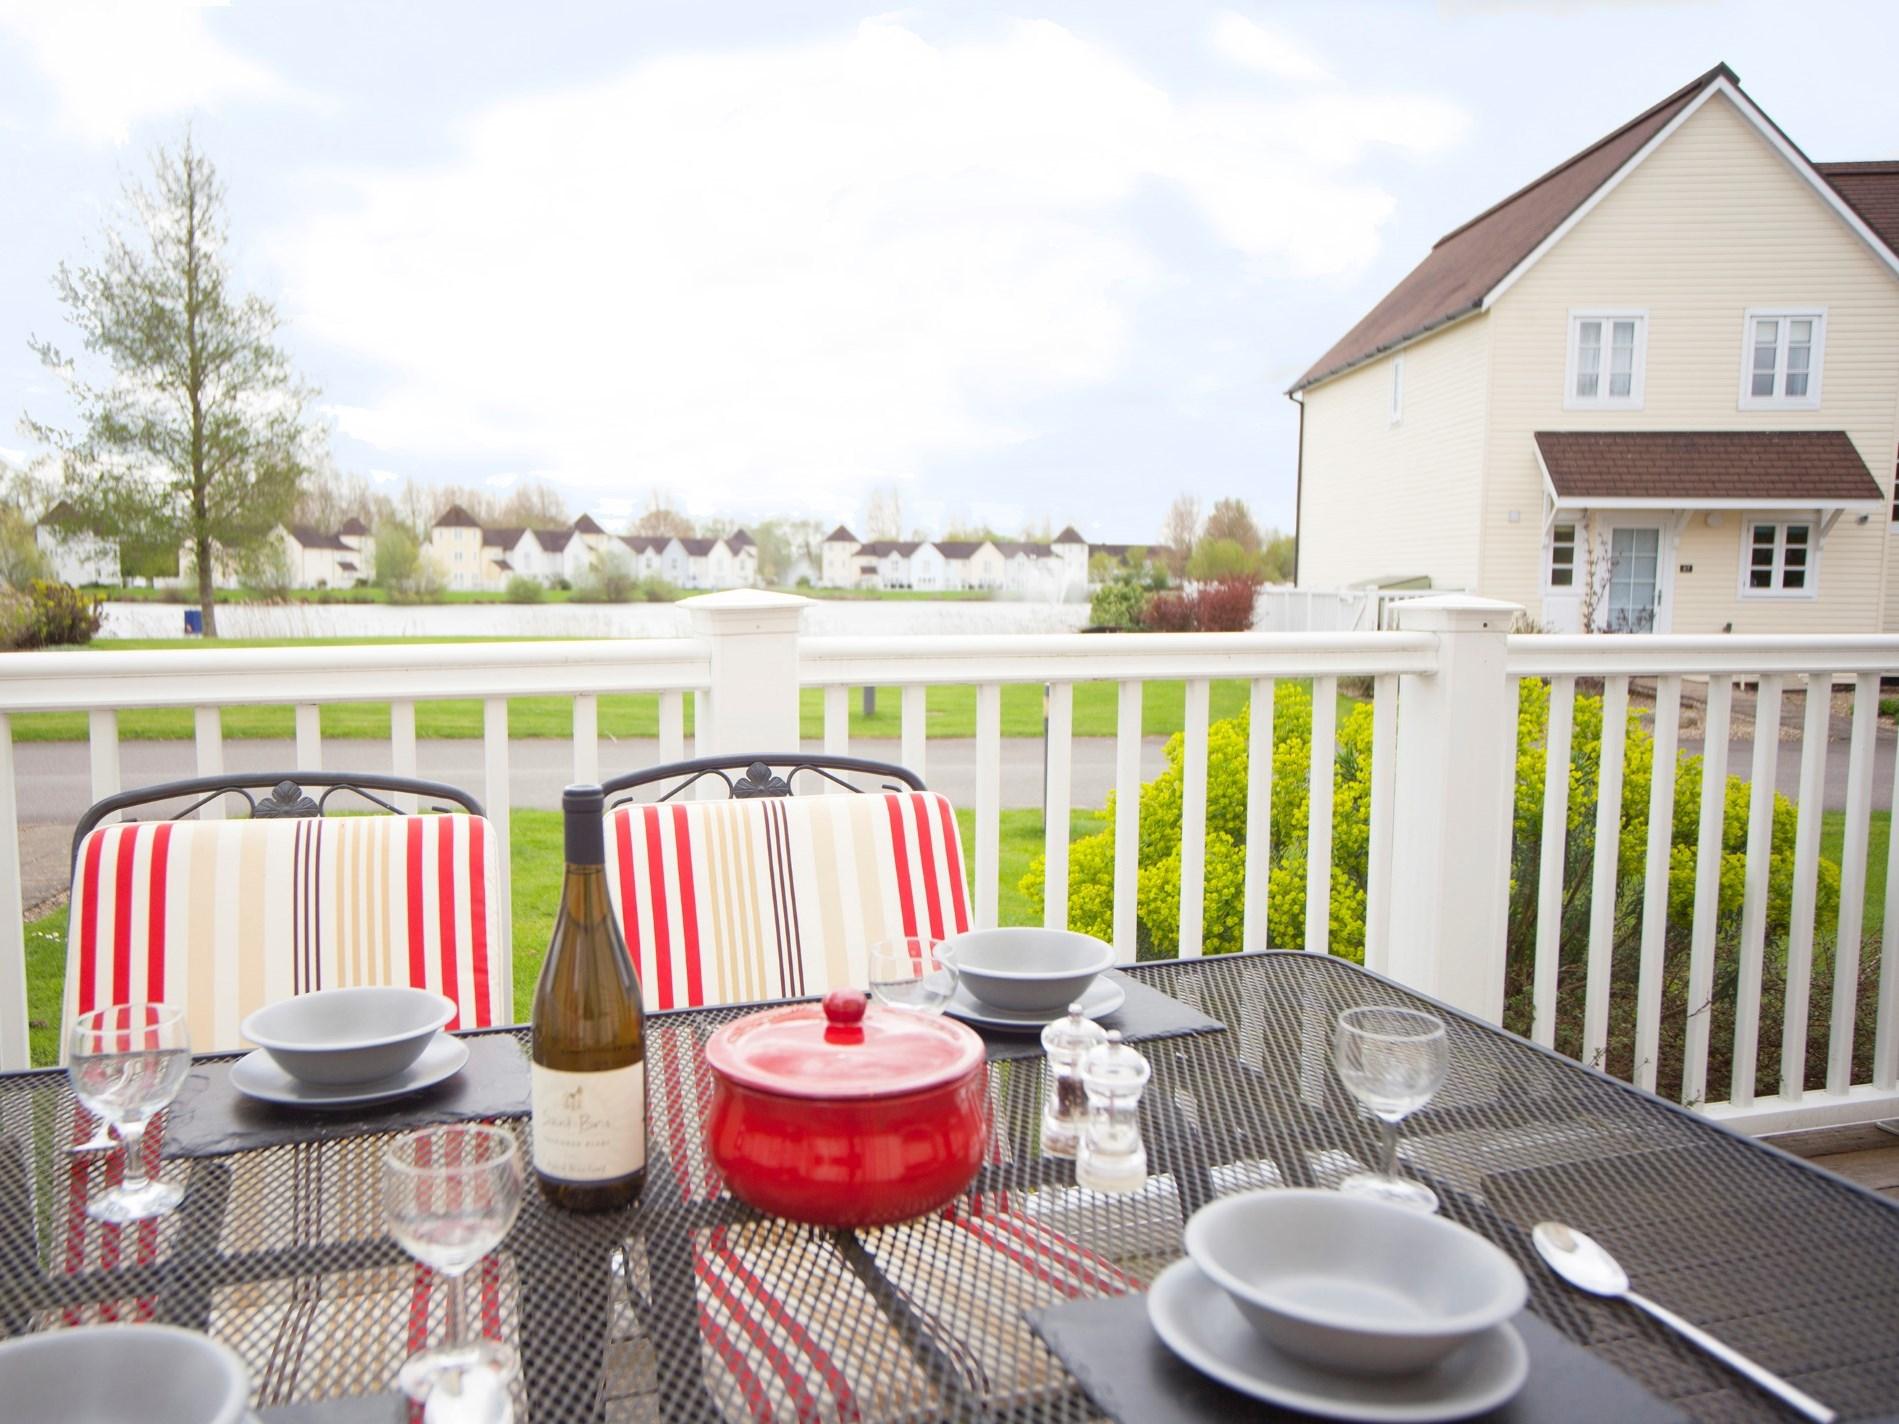 Enjoy your dinner on the balcony